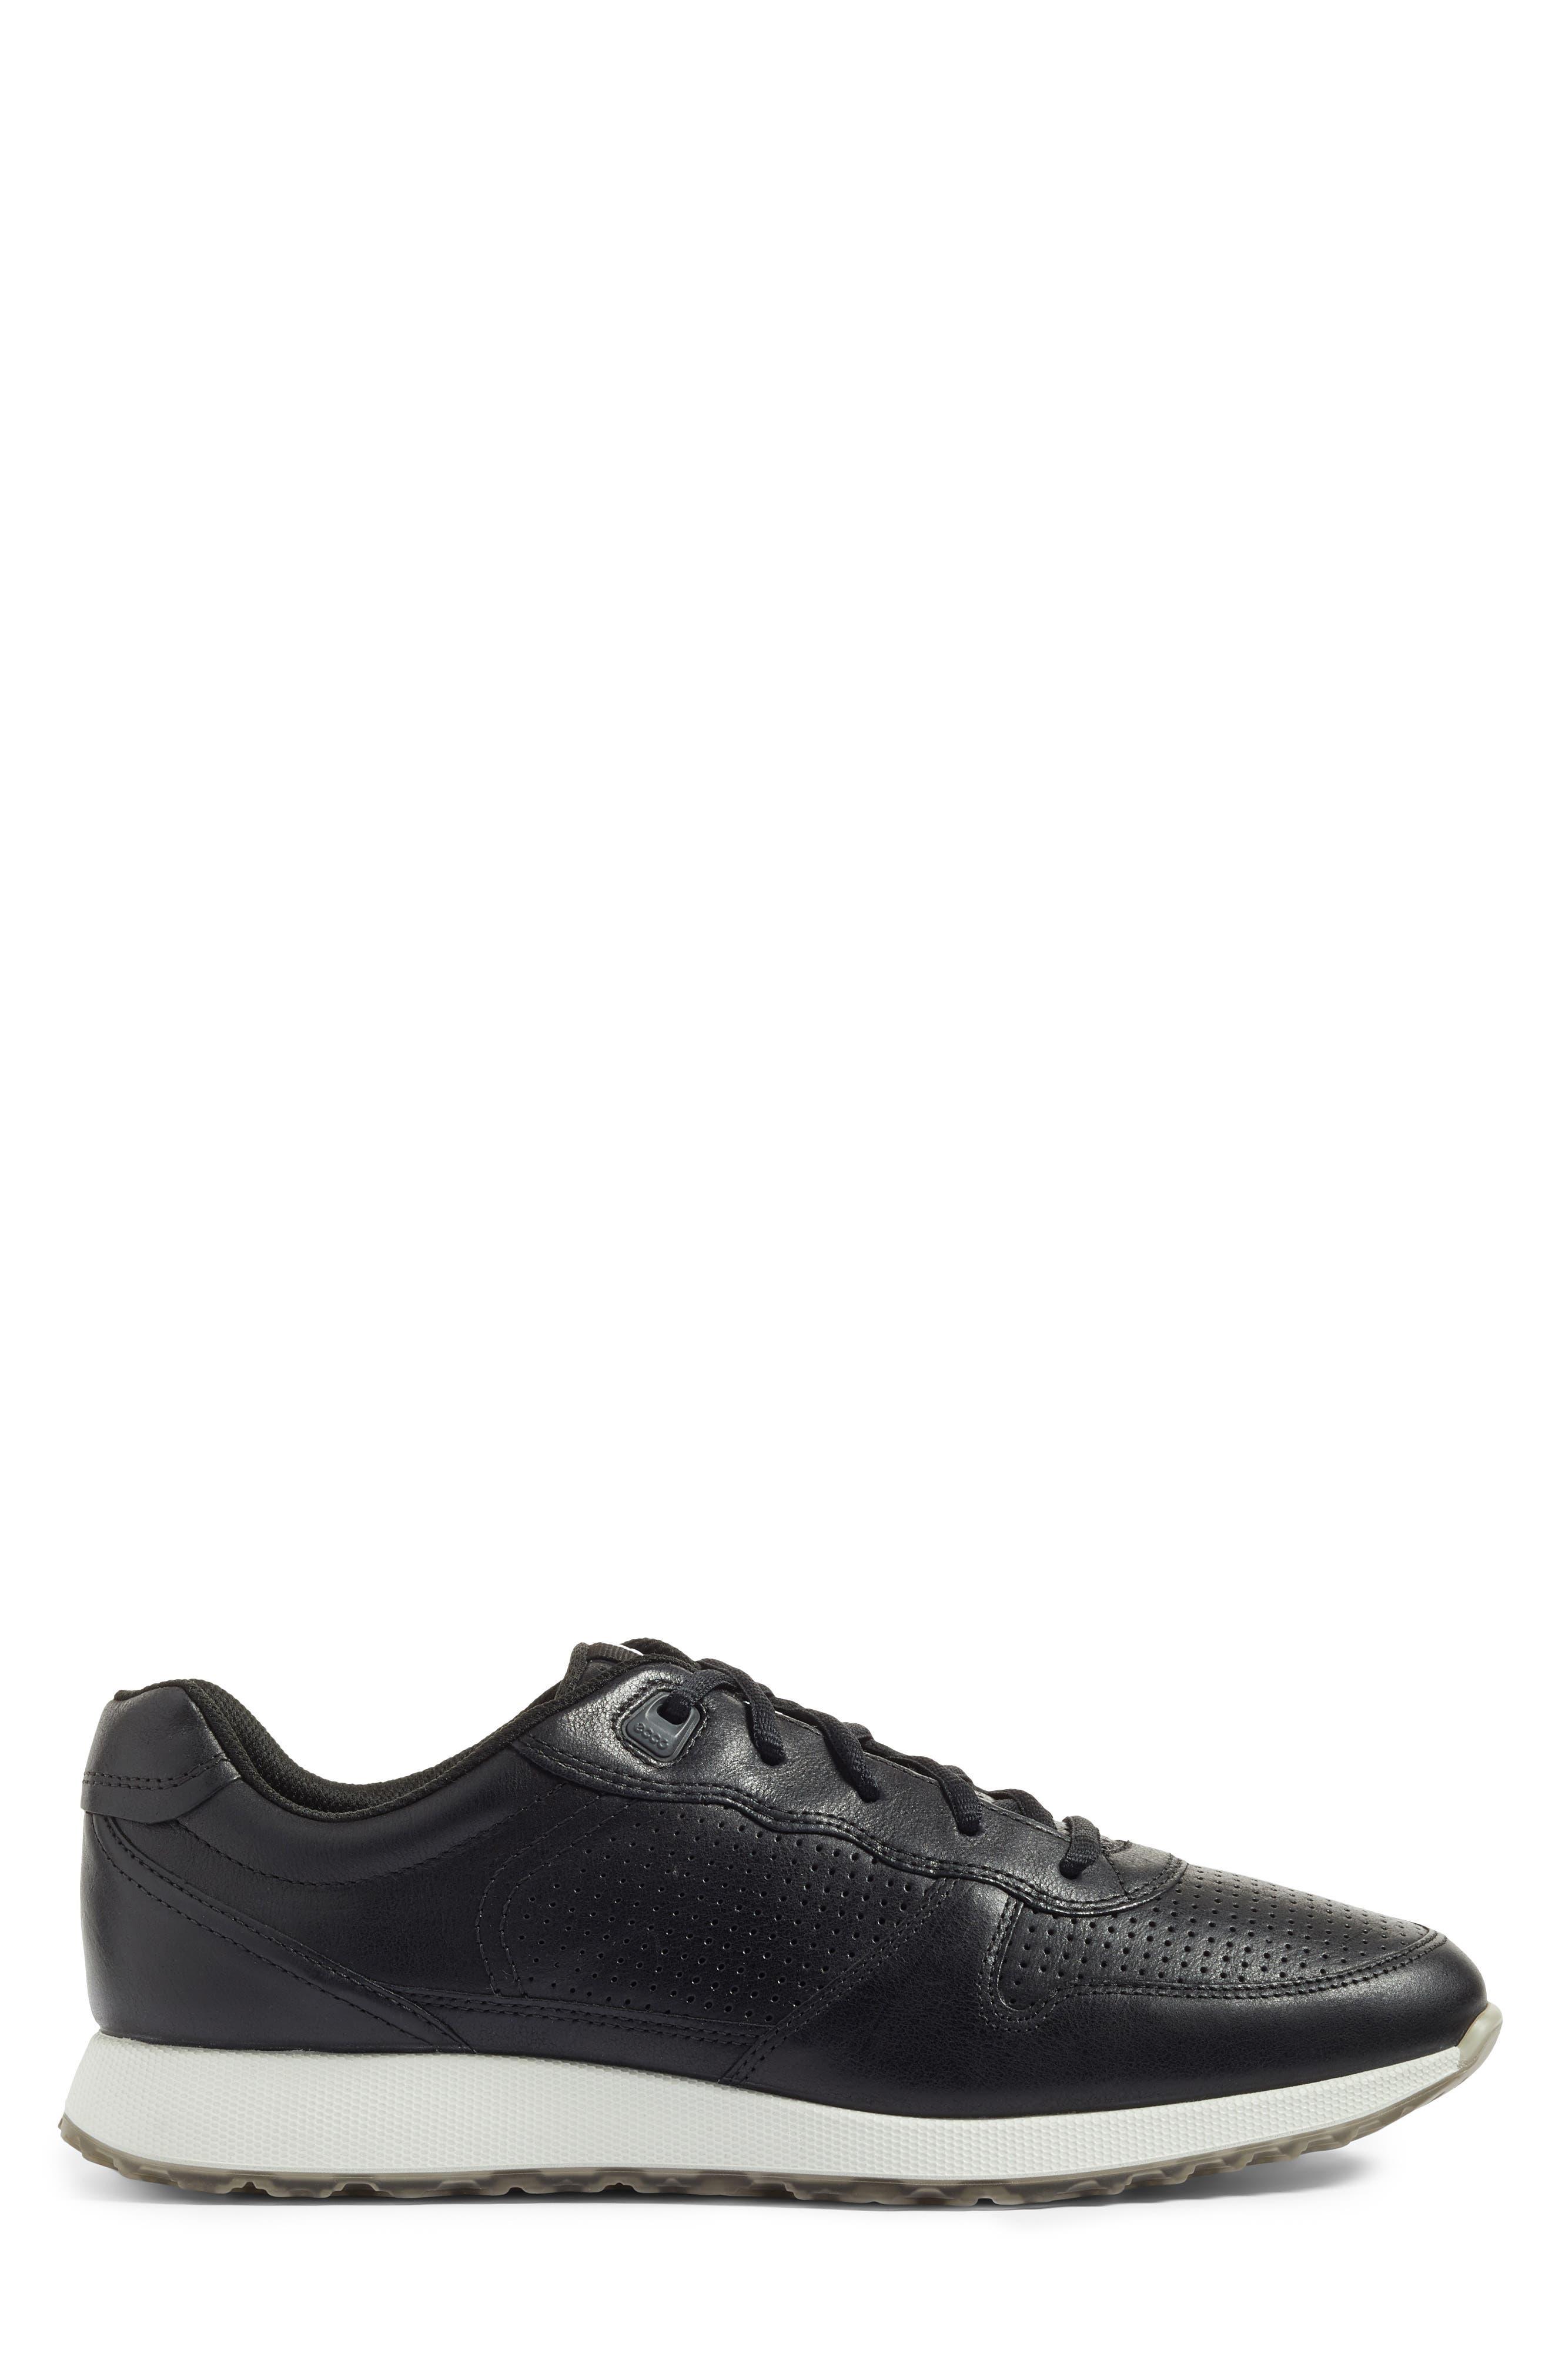 Sneak Sneaker,                             Alternate thumbnail 3, color,                             001